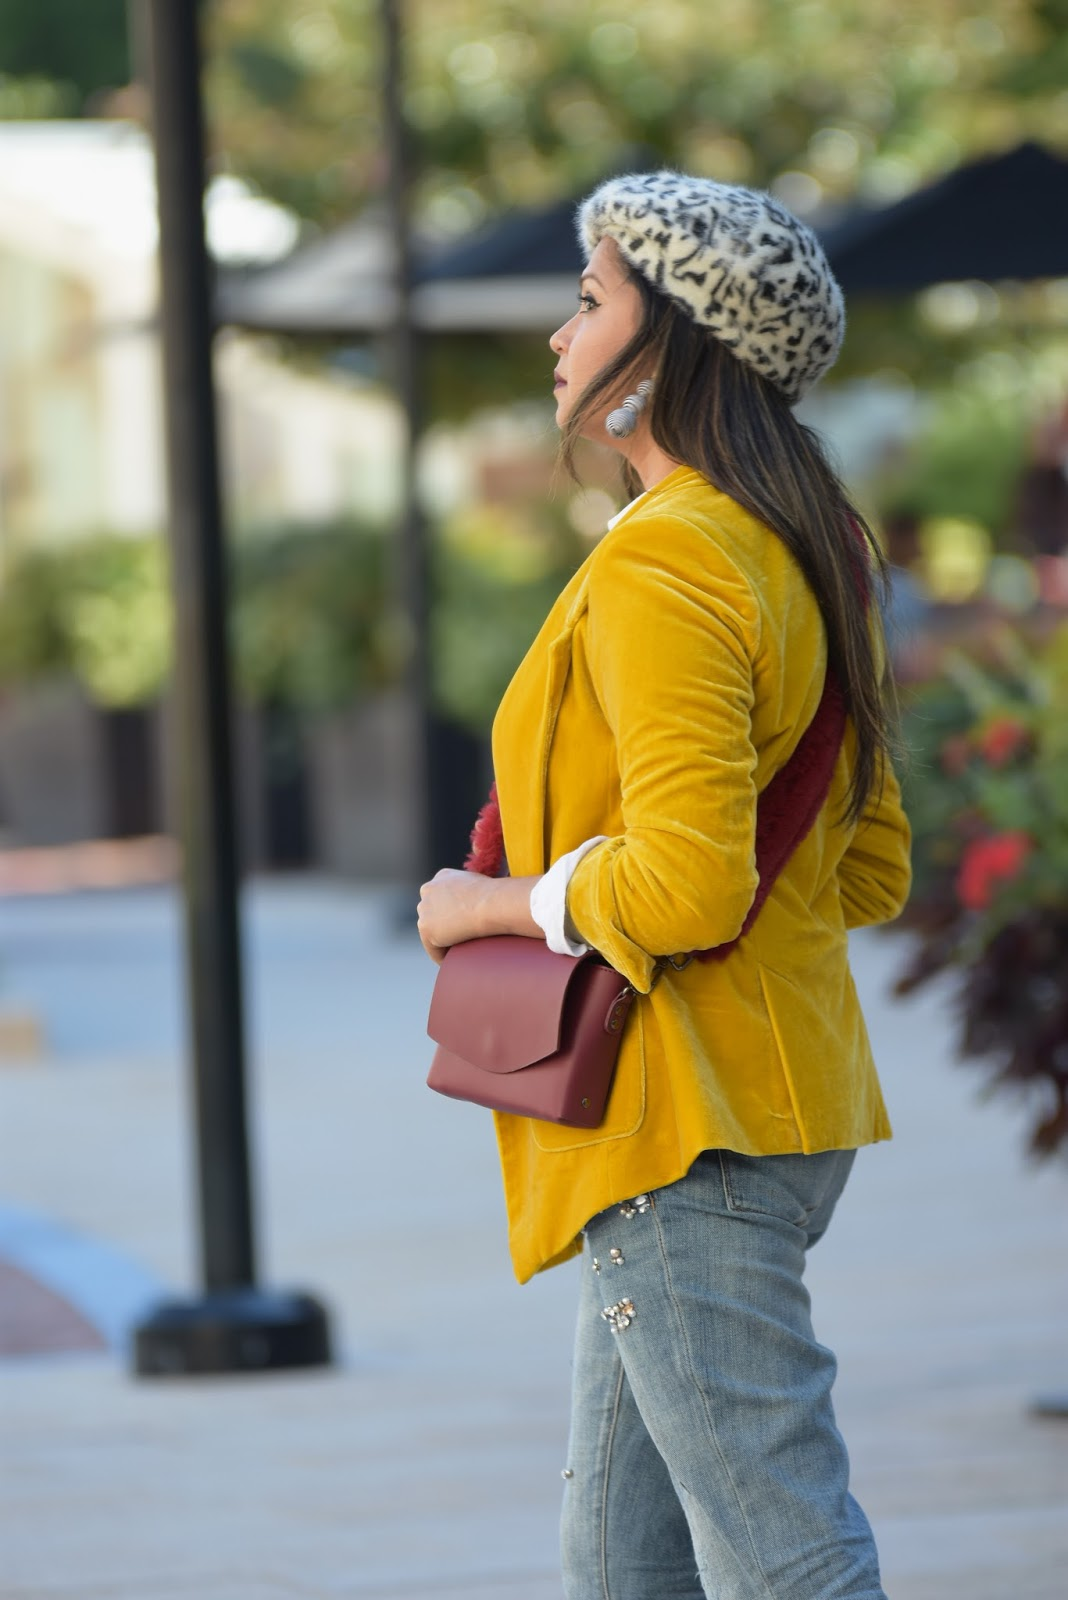 MUSTARD YELLOW JACKET, velvet blazer, fashion blogger, embellished sequin jean, boyfriend jeans, beret , animal print hat, fur bag, yello jacket casual outfit, myriad musings